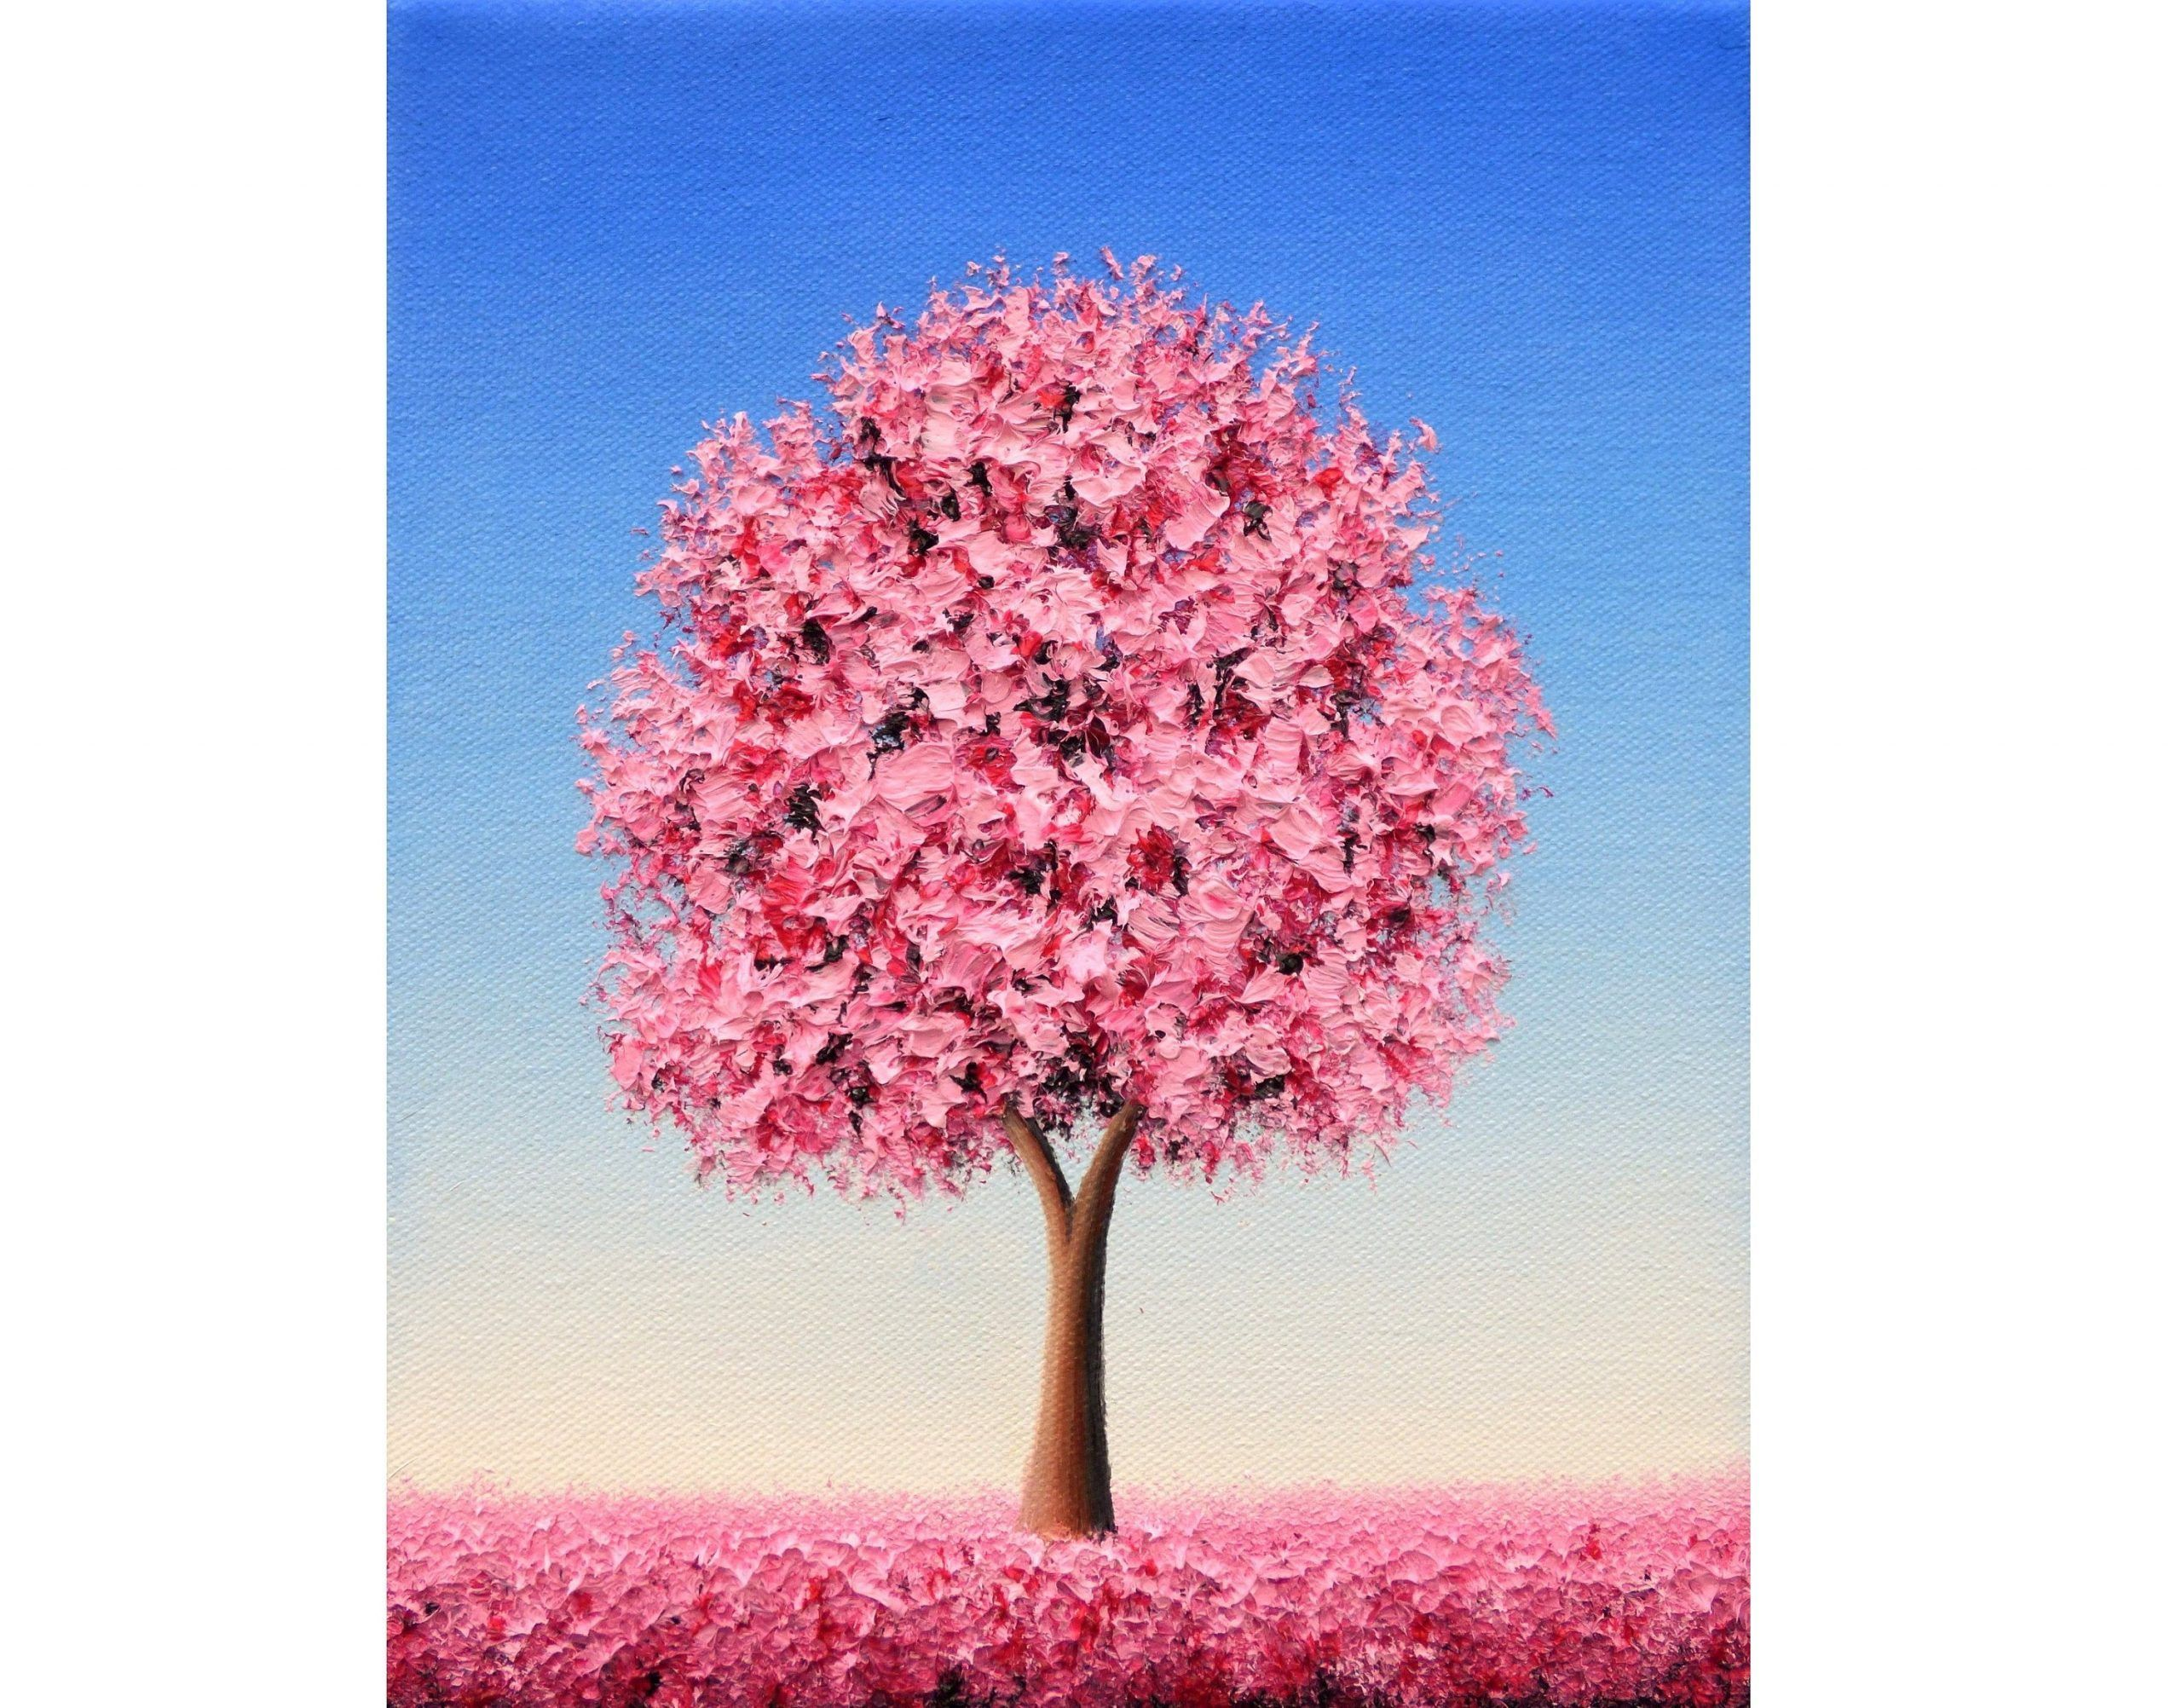 Cherry Blossom Tree Painting Original Oil Painting Expressionist Spring Painti Blossom Cherry Expressionist Oil O Tree Painting Tree Art Blossom Trees